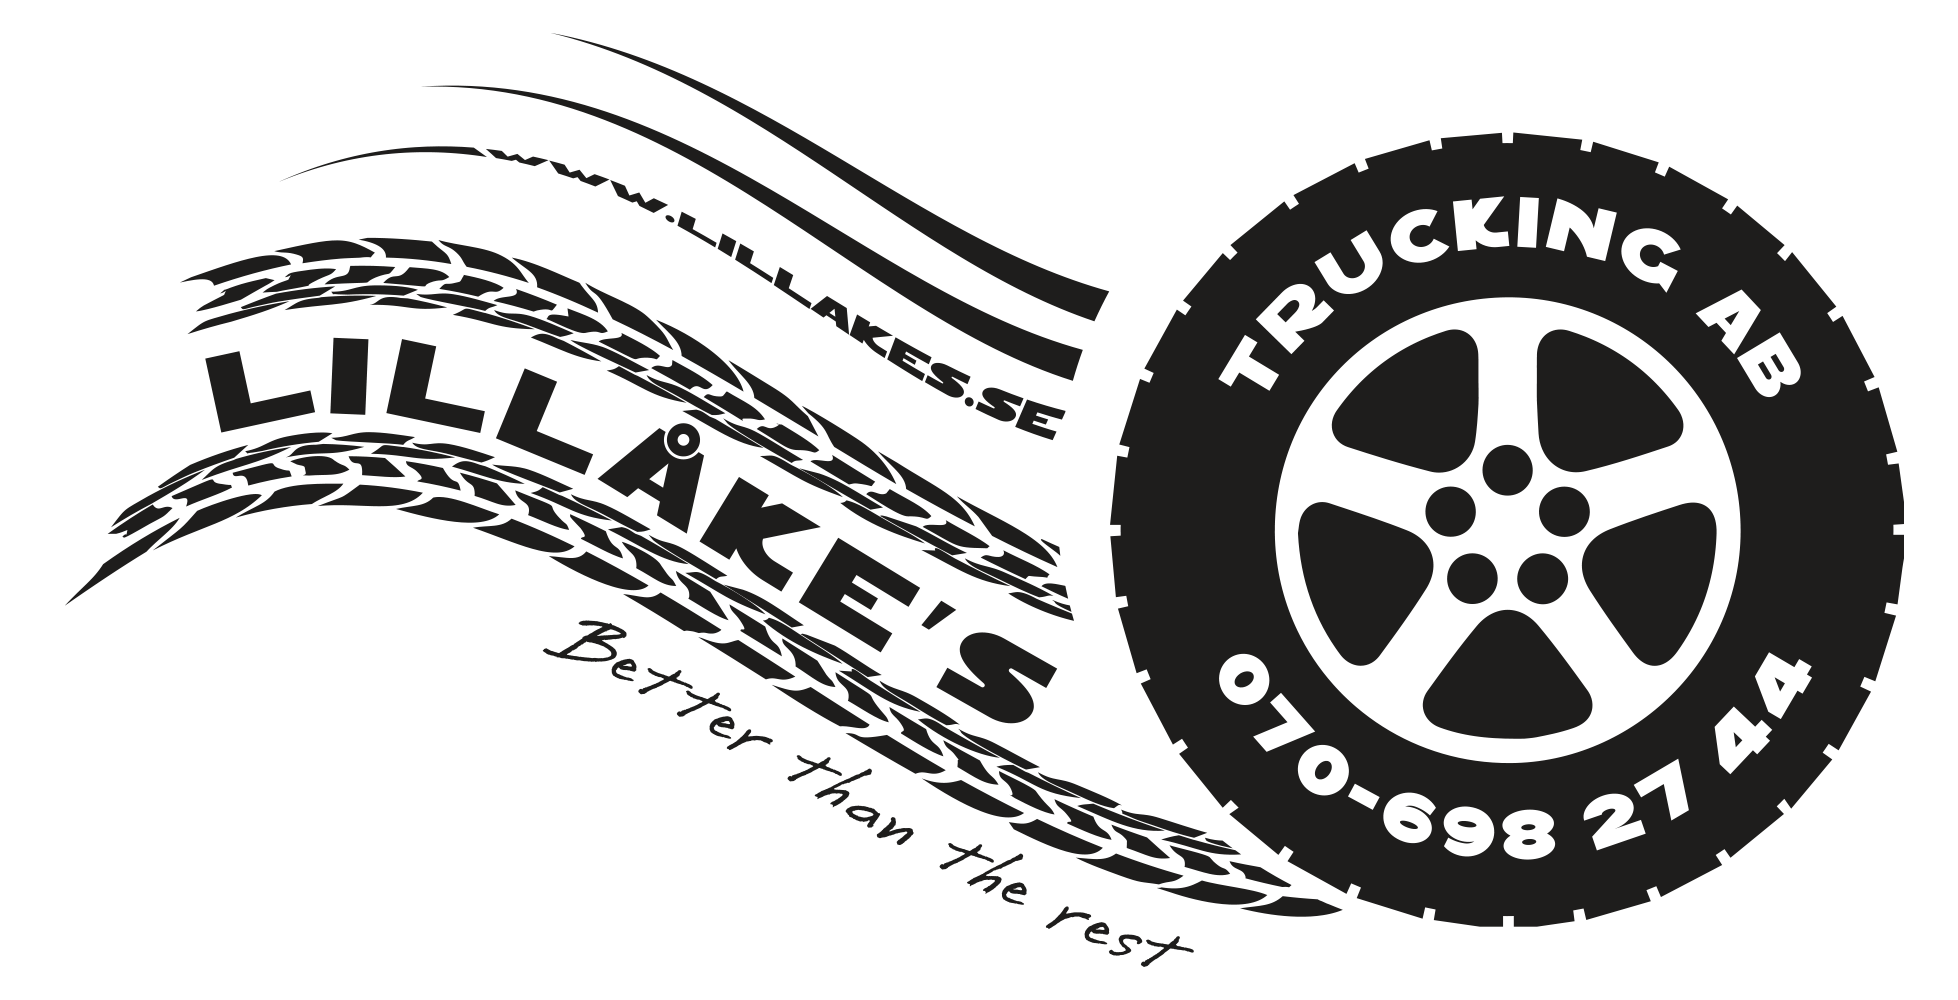 LillÅkes Trucking AB